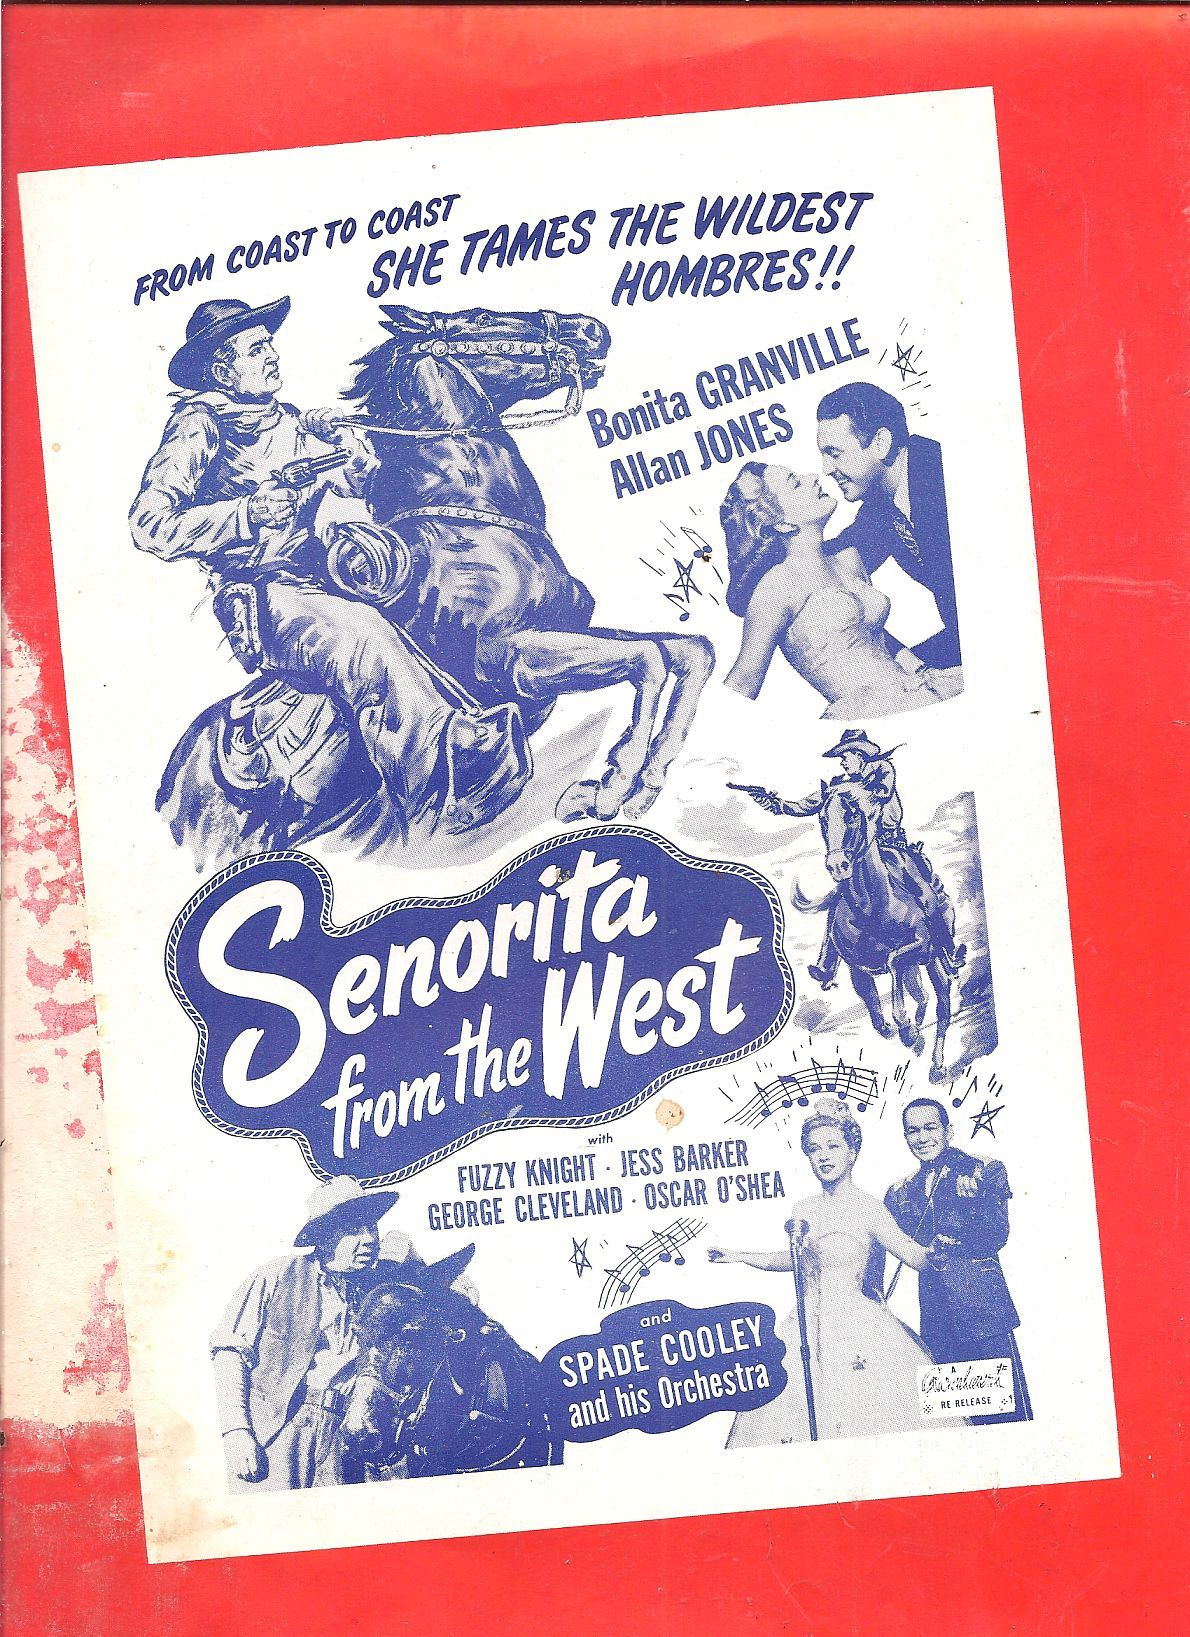 Spade Cooley, Bonita Granville, Allan Jones, and Fuzzy Knight in Senorita from the West (1945)